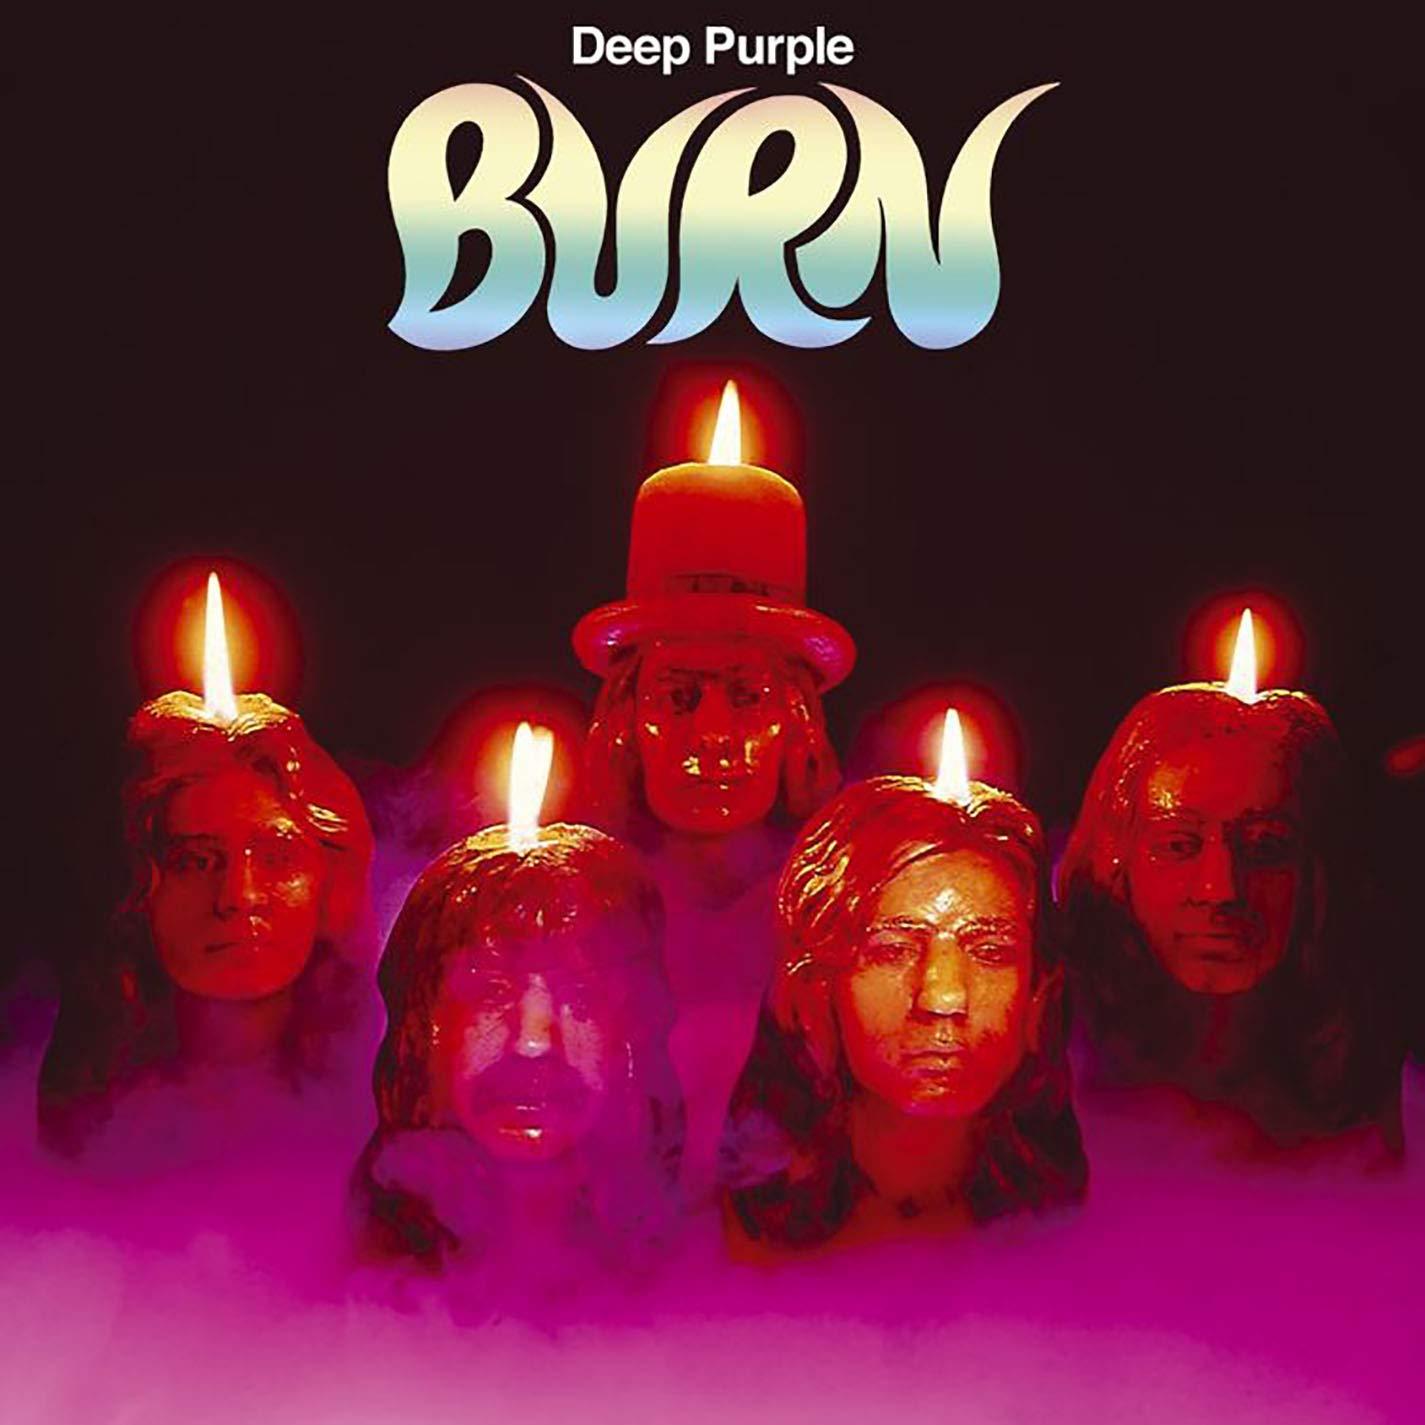 Deep Purple - Burn (1974) [FLAC] Download